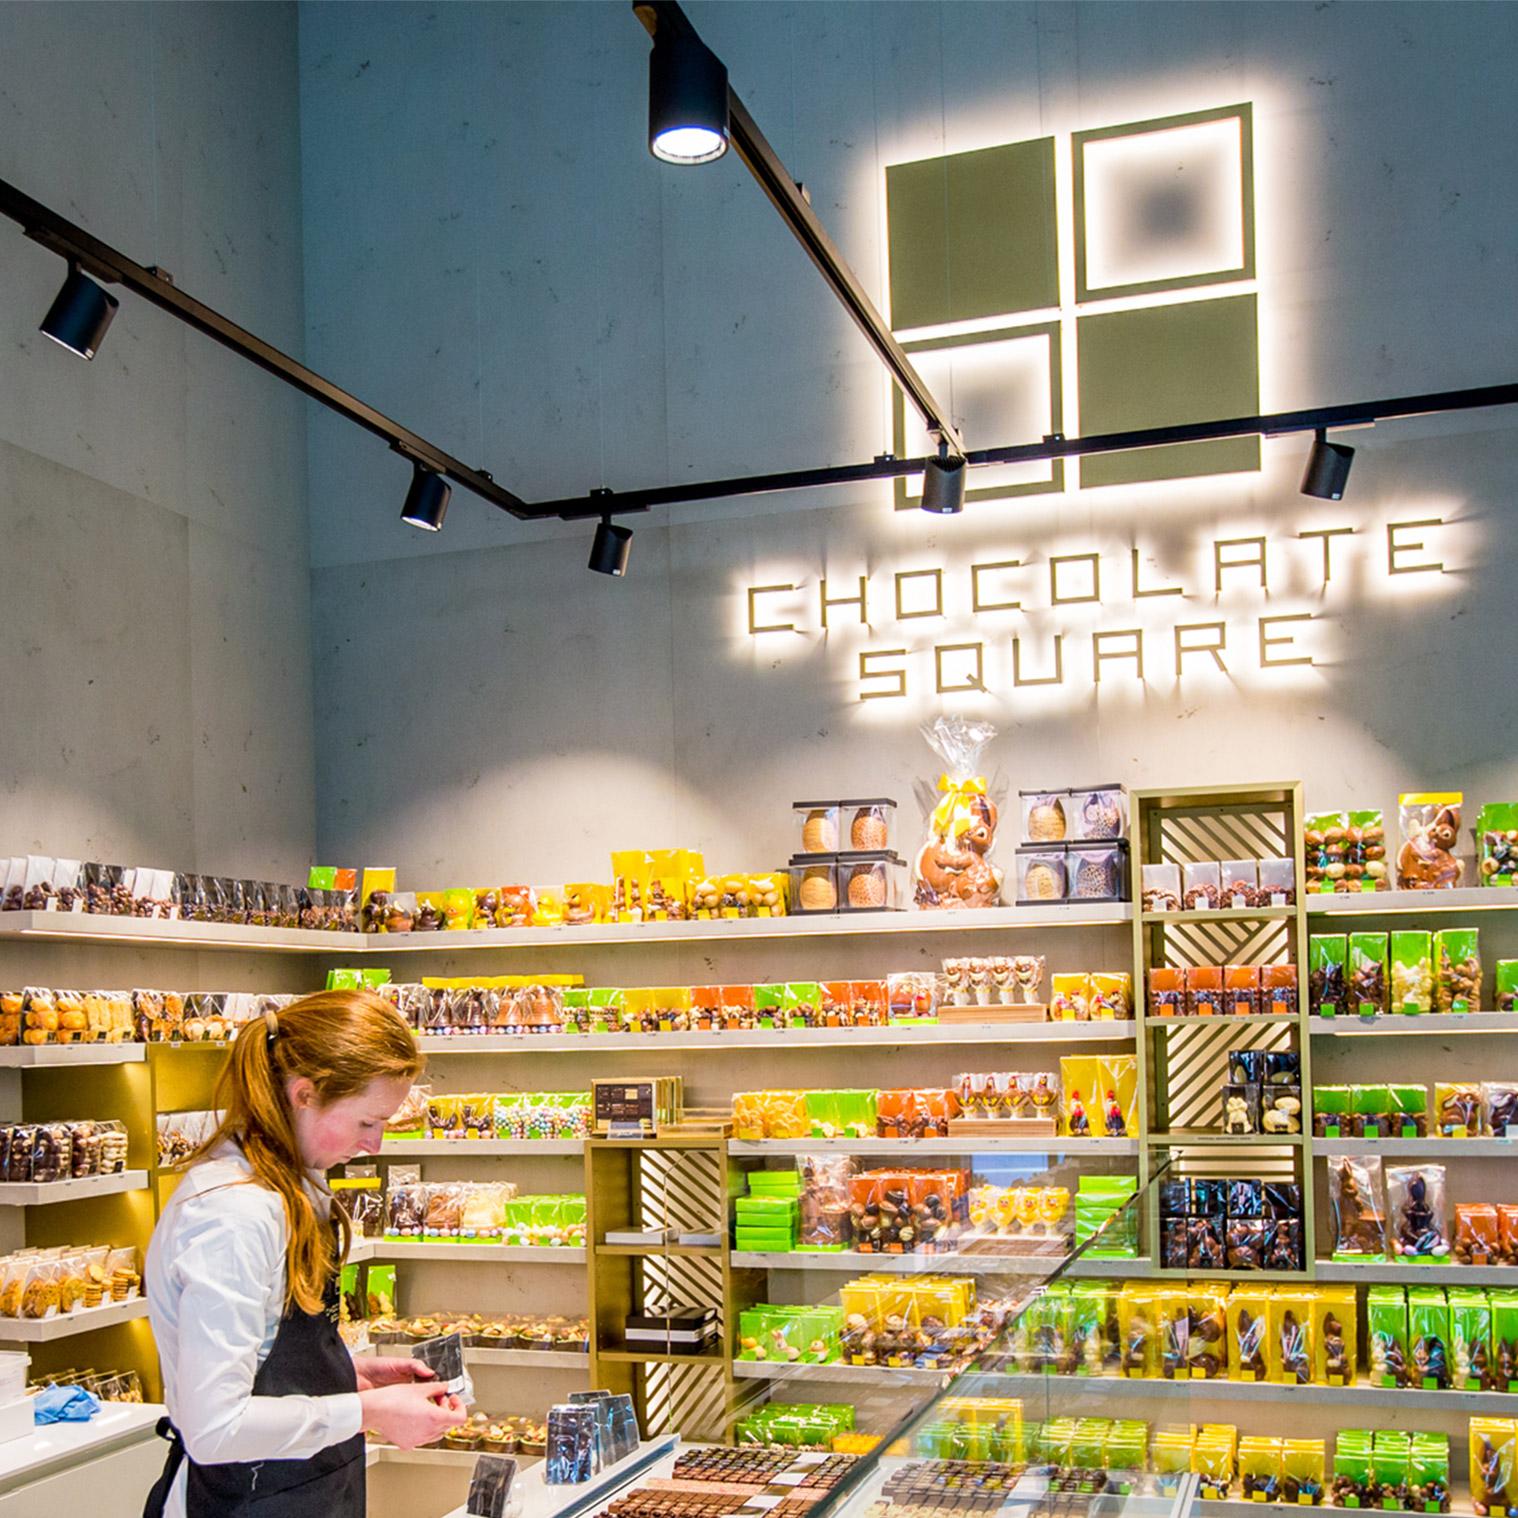 10-ChocolateSquare-08b